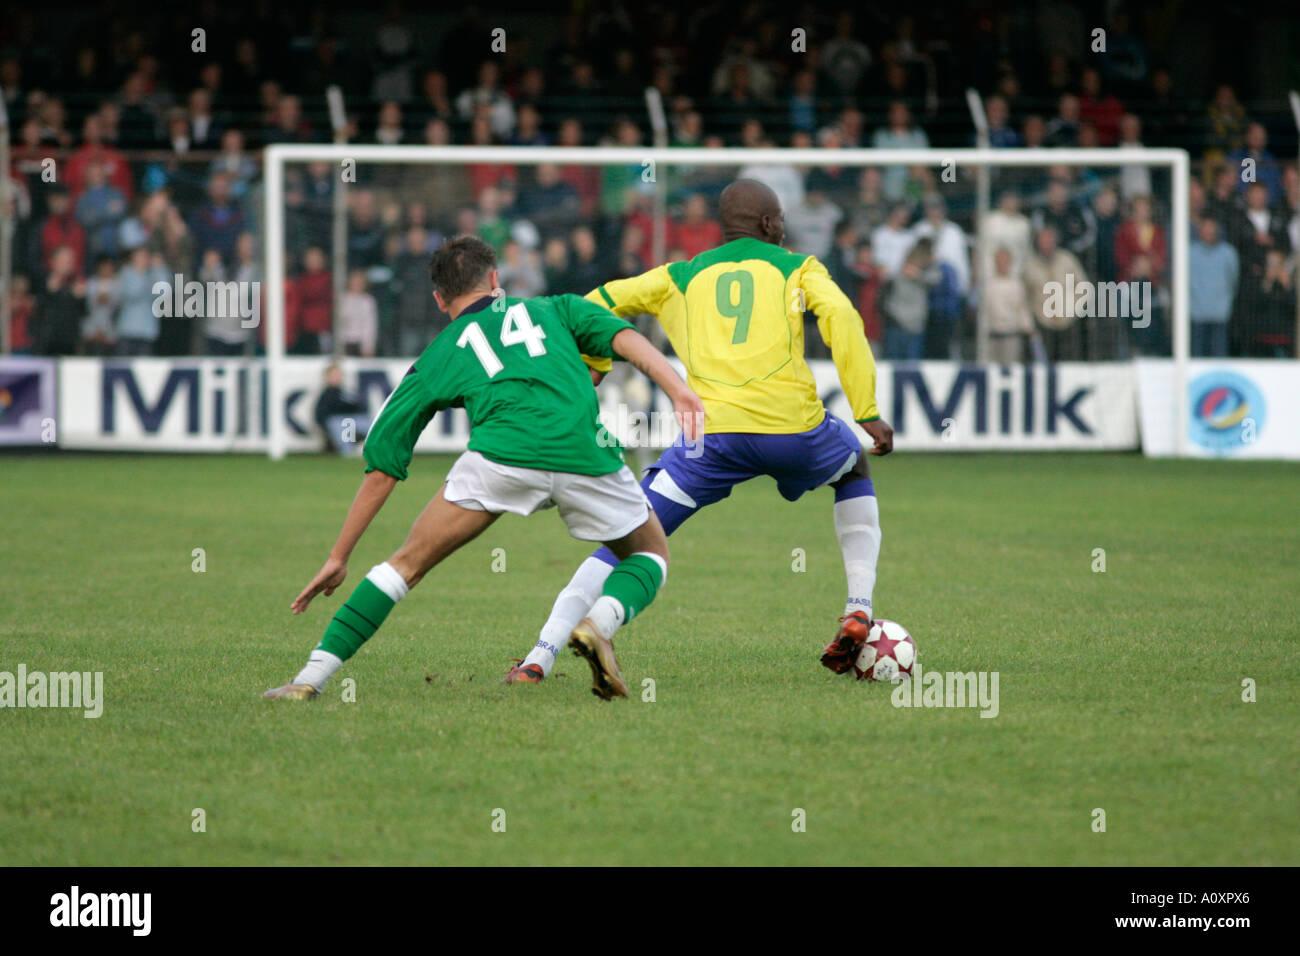 5fe15c8ec22 N Ireland 14 Jonny Steele challenges Brazil 9 Fabiano Oliveira for the ball  Northern Ireland v